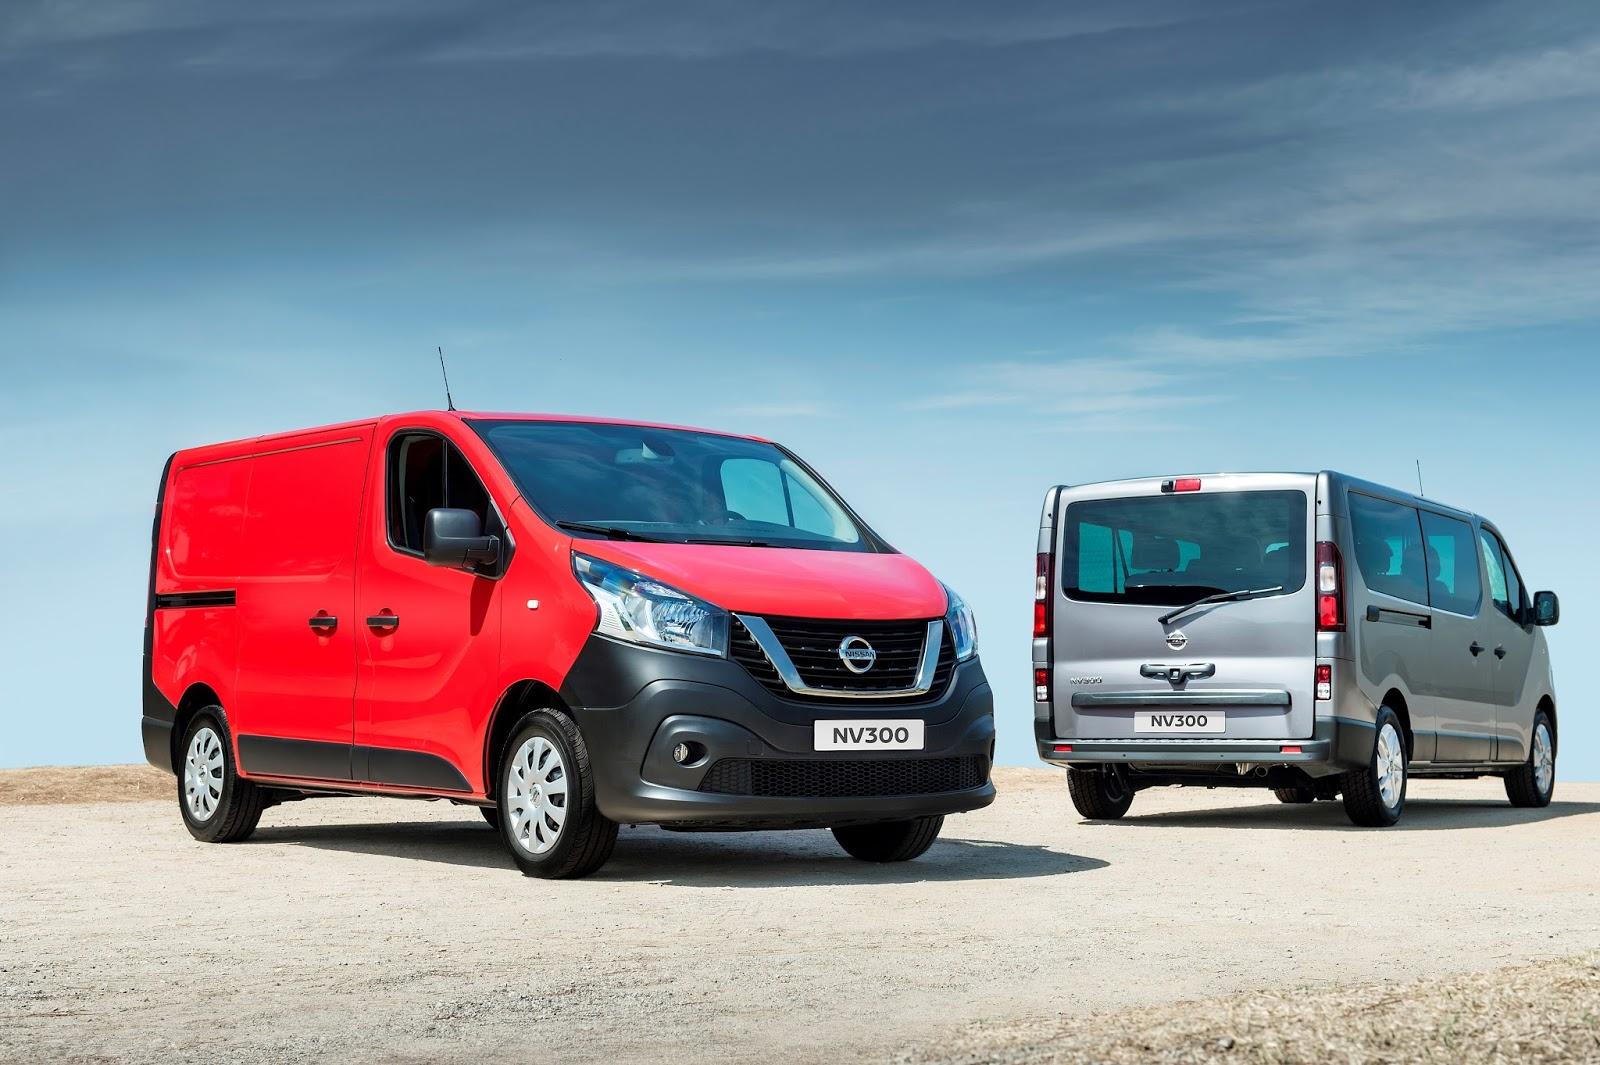 426150062 Nissan NV300 Van and Combi Παγκόσμιο ντεμπούτο για το νέο Nissan NV300